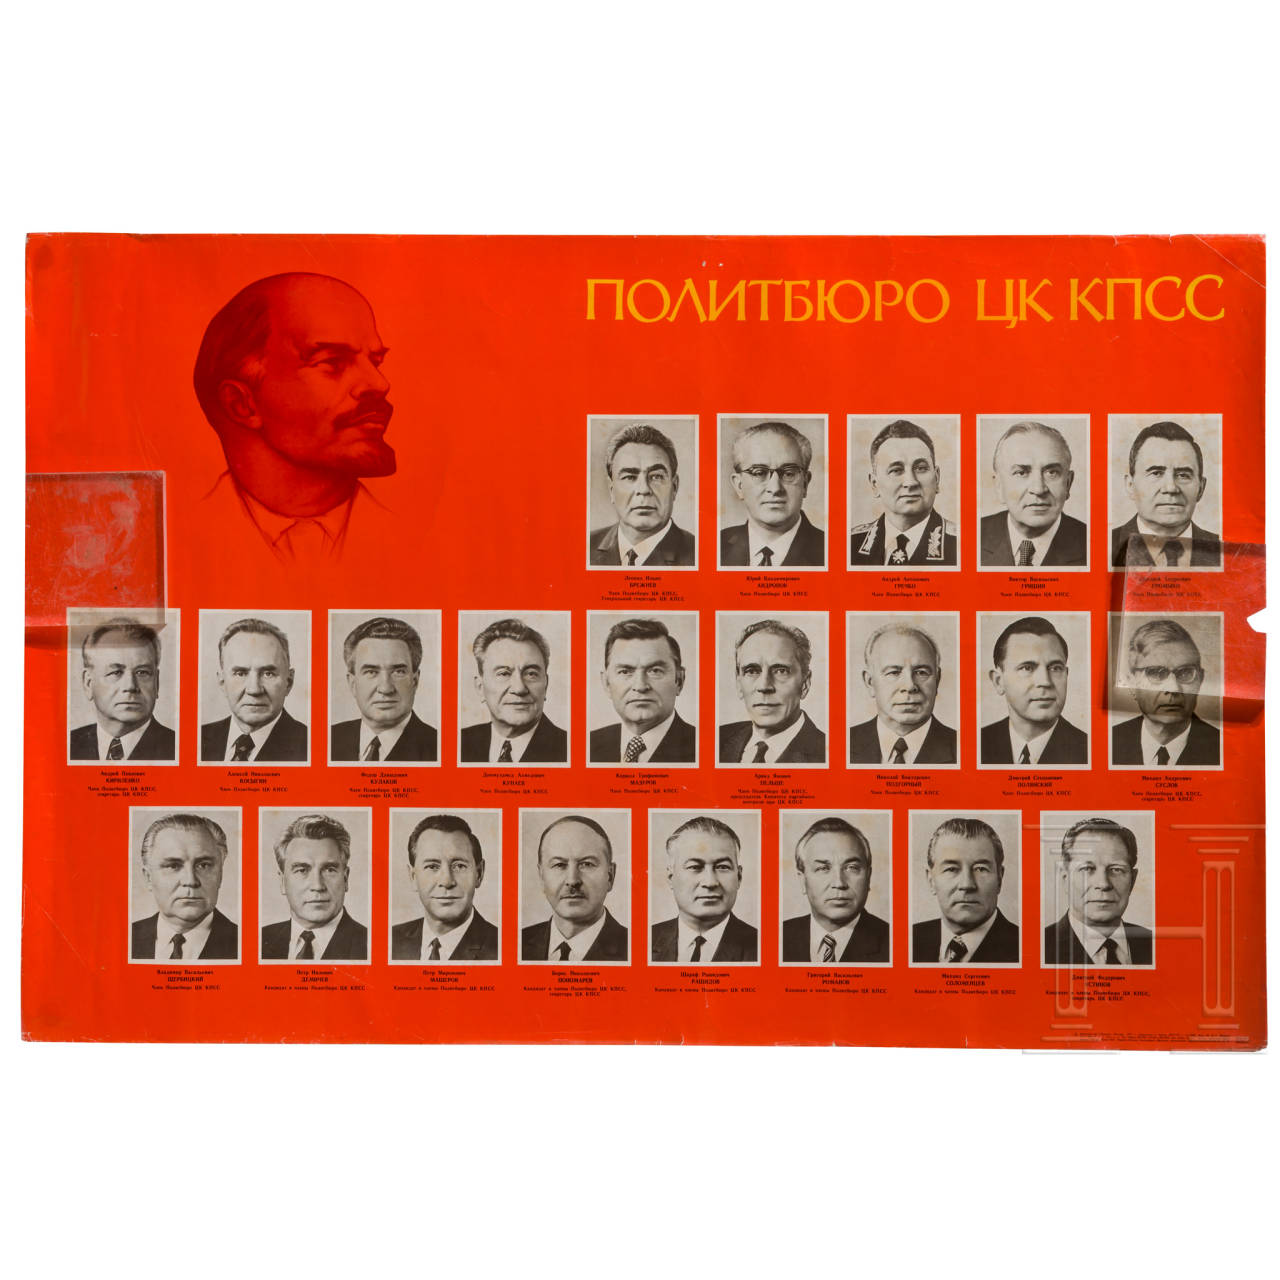 Drei Propagandaplakate, 1970er Jahre